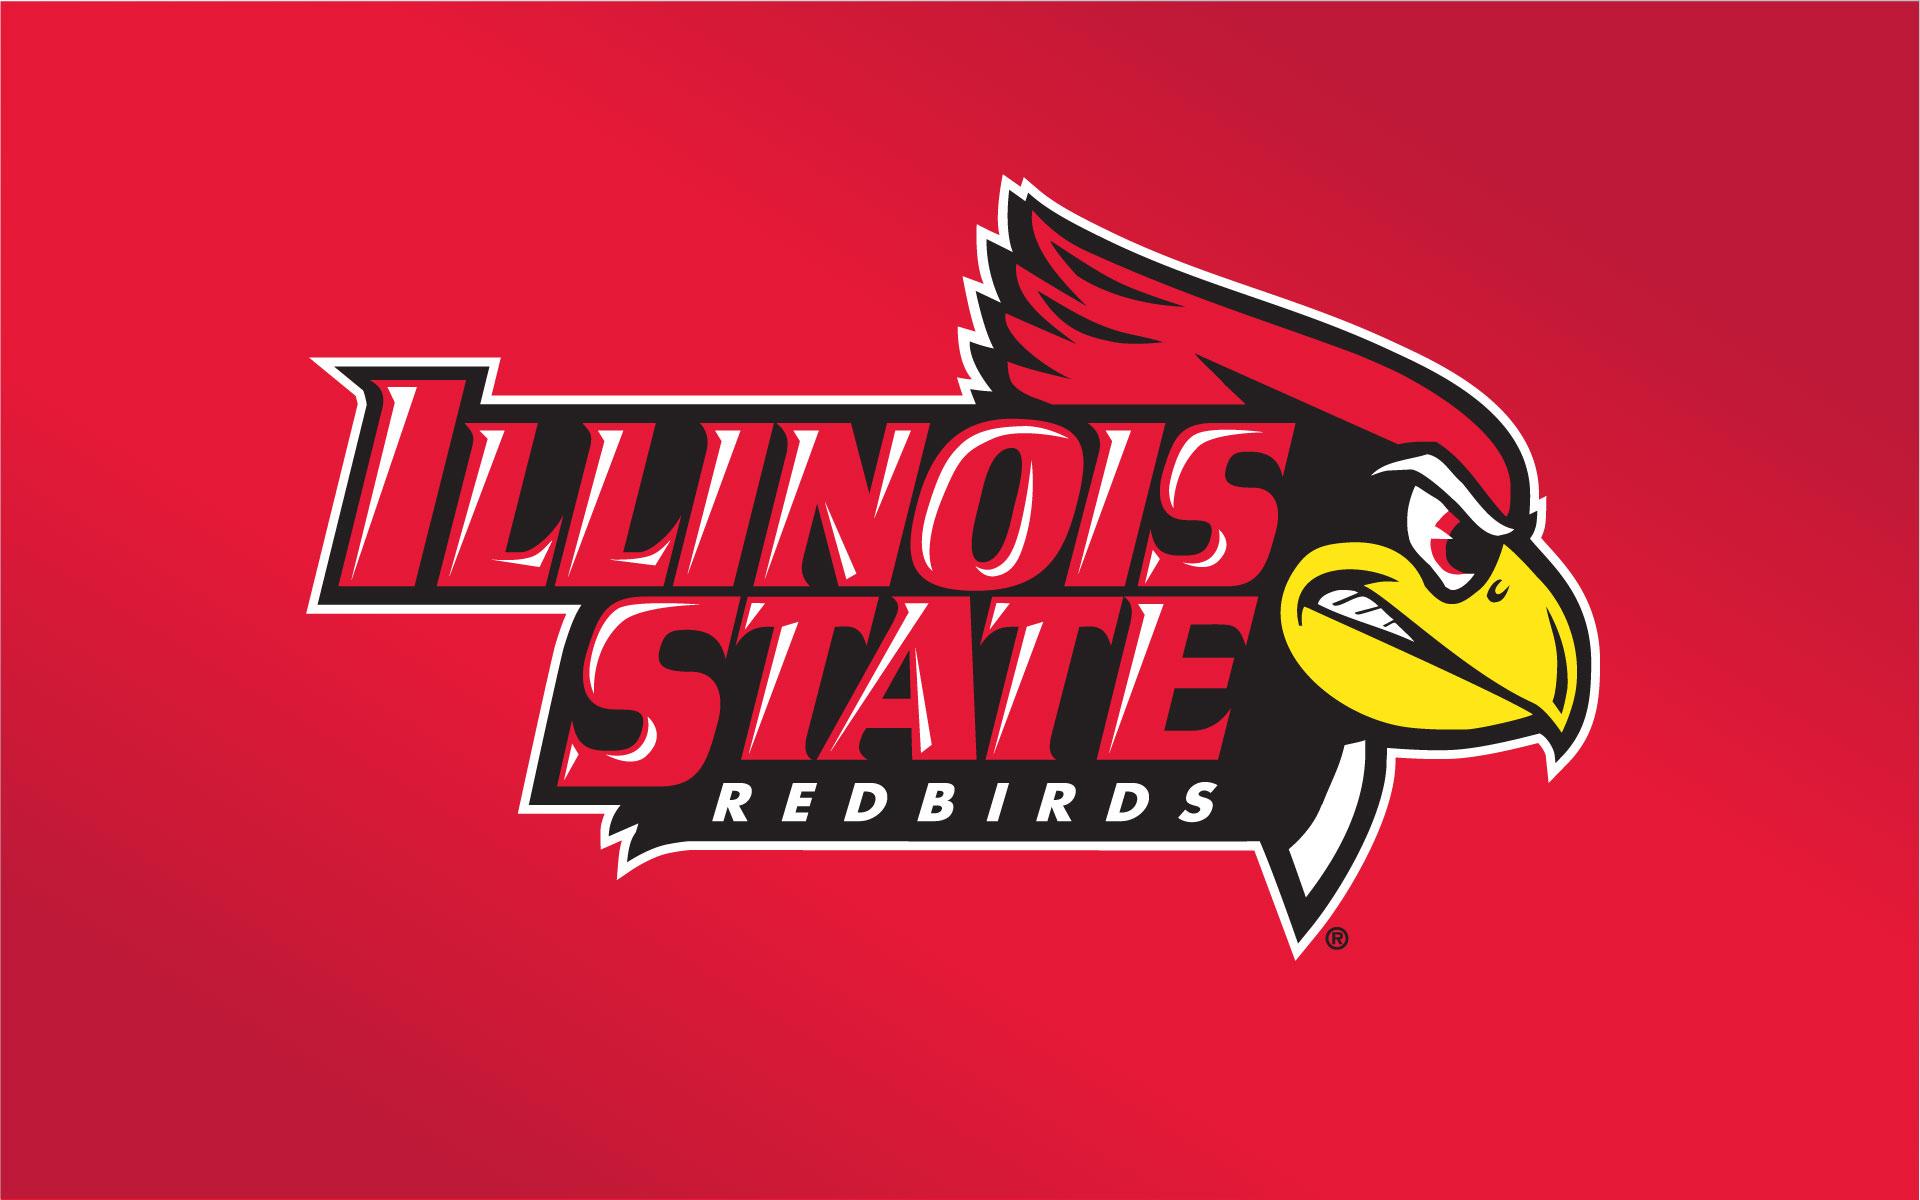 A-desktop-background-for-Illinois-State-students-and-alumni-http-Alumni-IllinoisState-edu-wallpaper-wp3002864